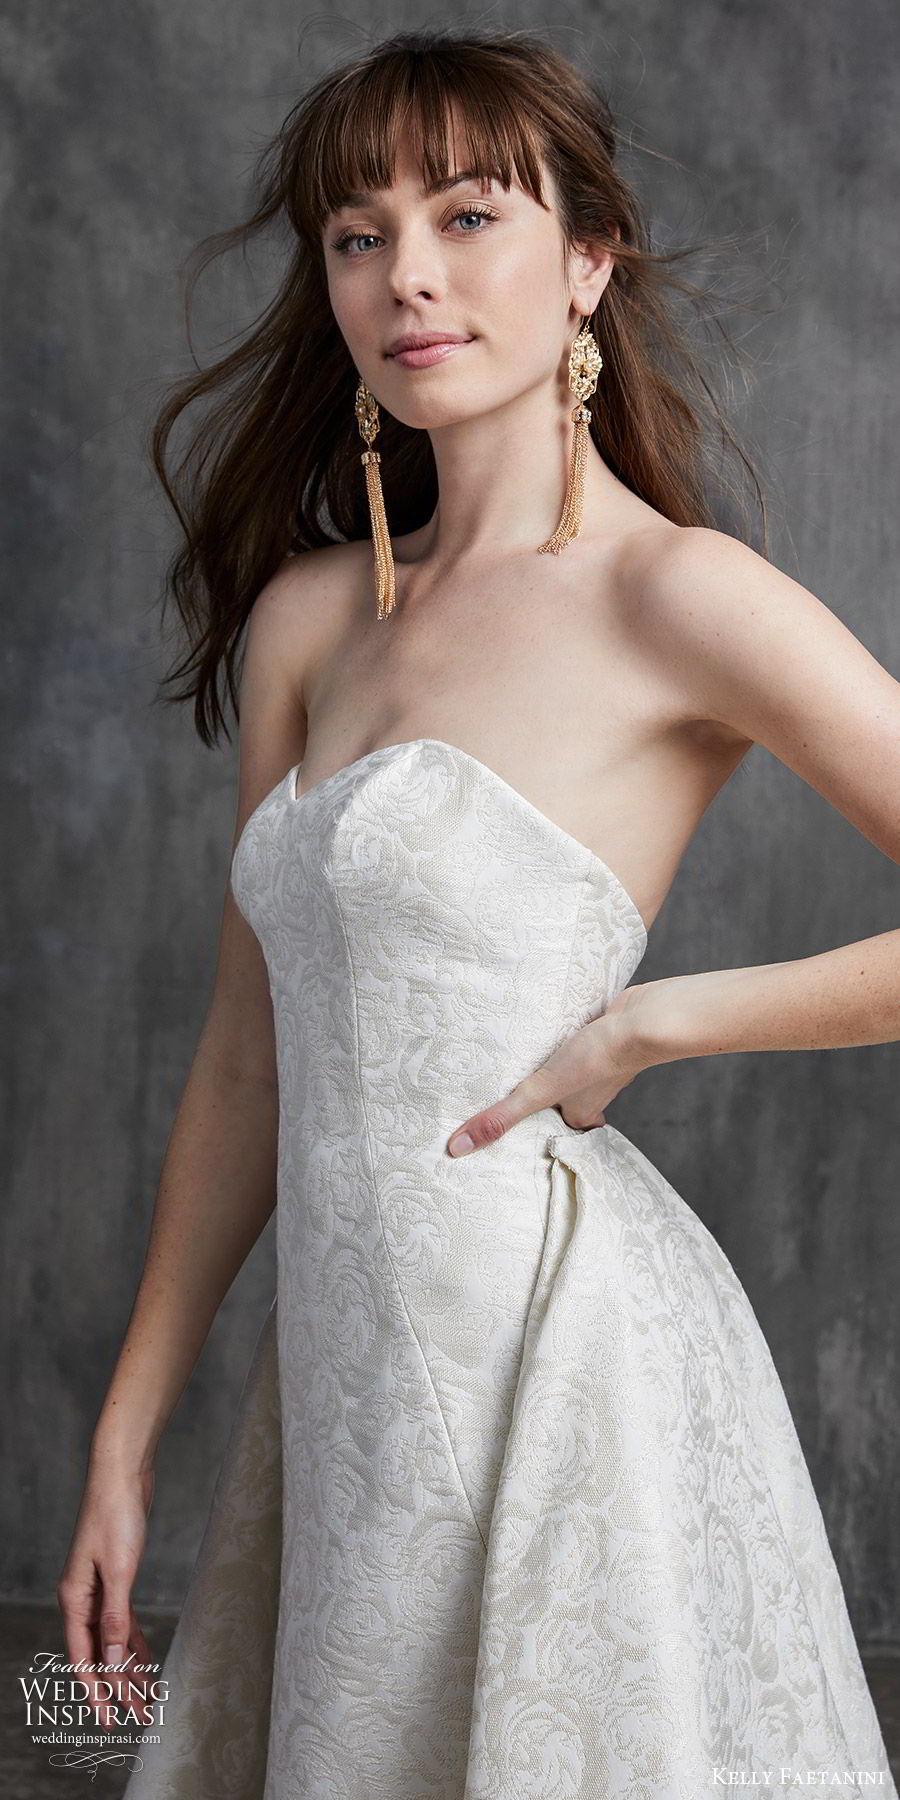 kelly faetanini spring 2020 bridal strapless sweetheart sheath mermaid embellished wedding dress (9) a line overskirt chapel train elegant classic zv